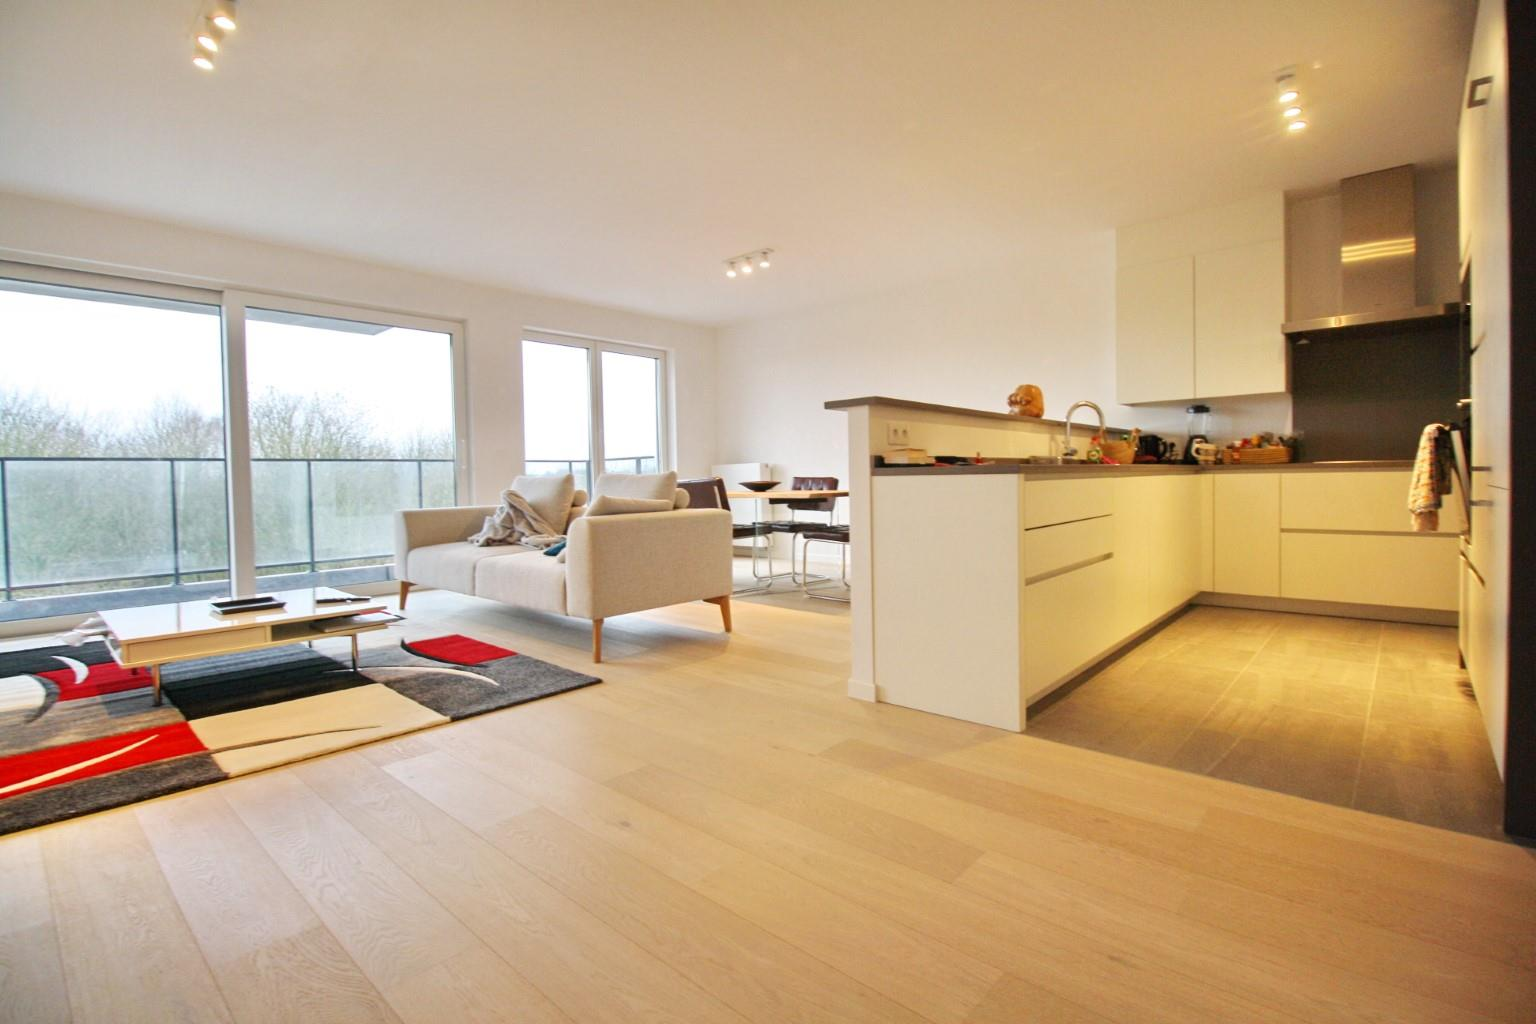 Appartement - Woluwe-Saint-Lambert - #3308144-3